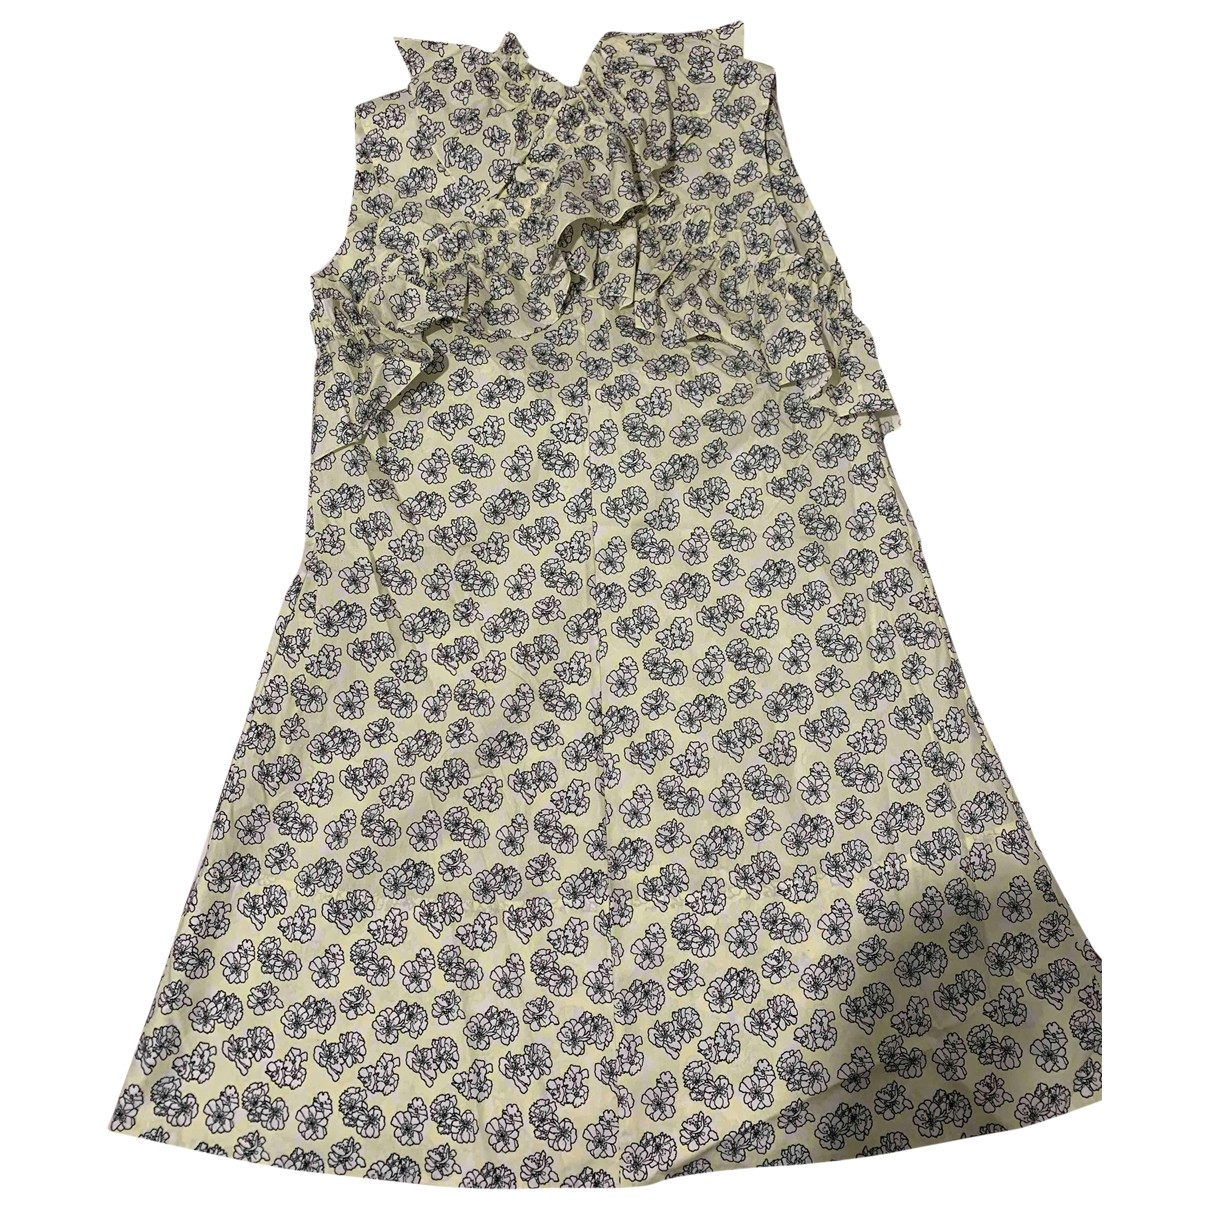 Marni \N Yellow Cotton dress for Women L International